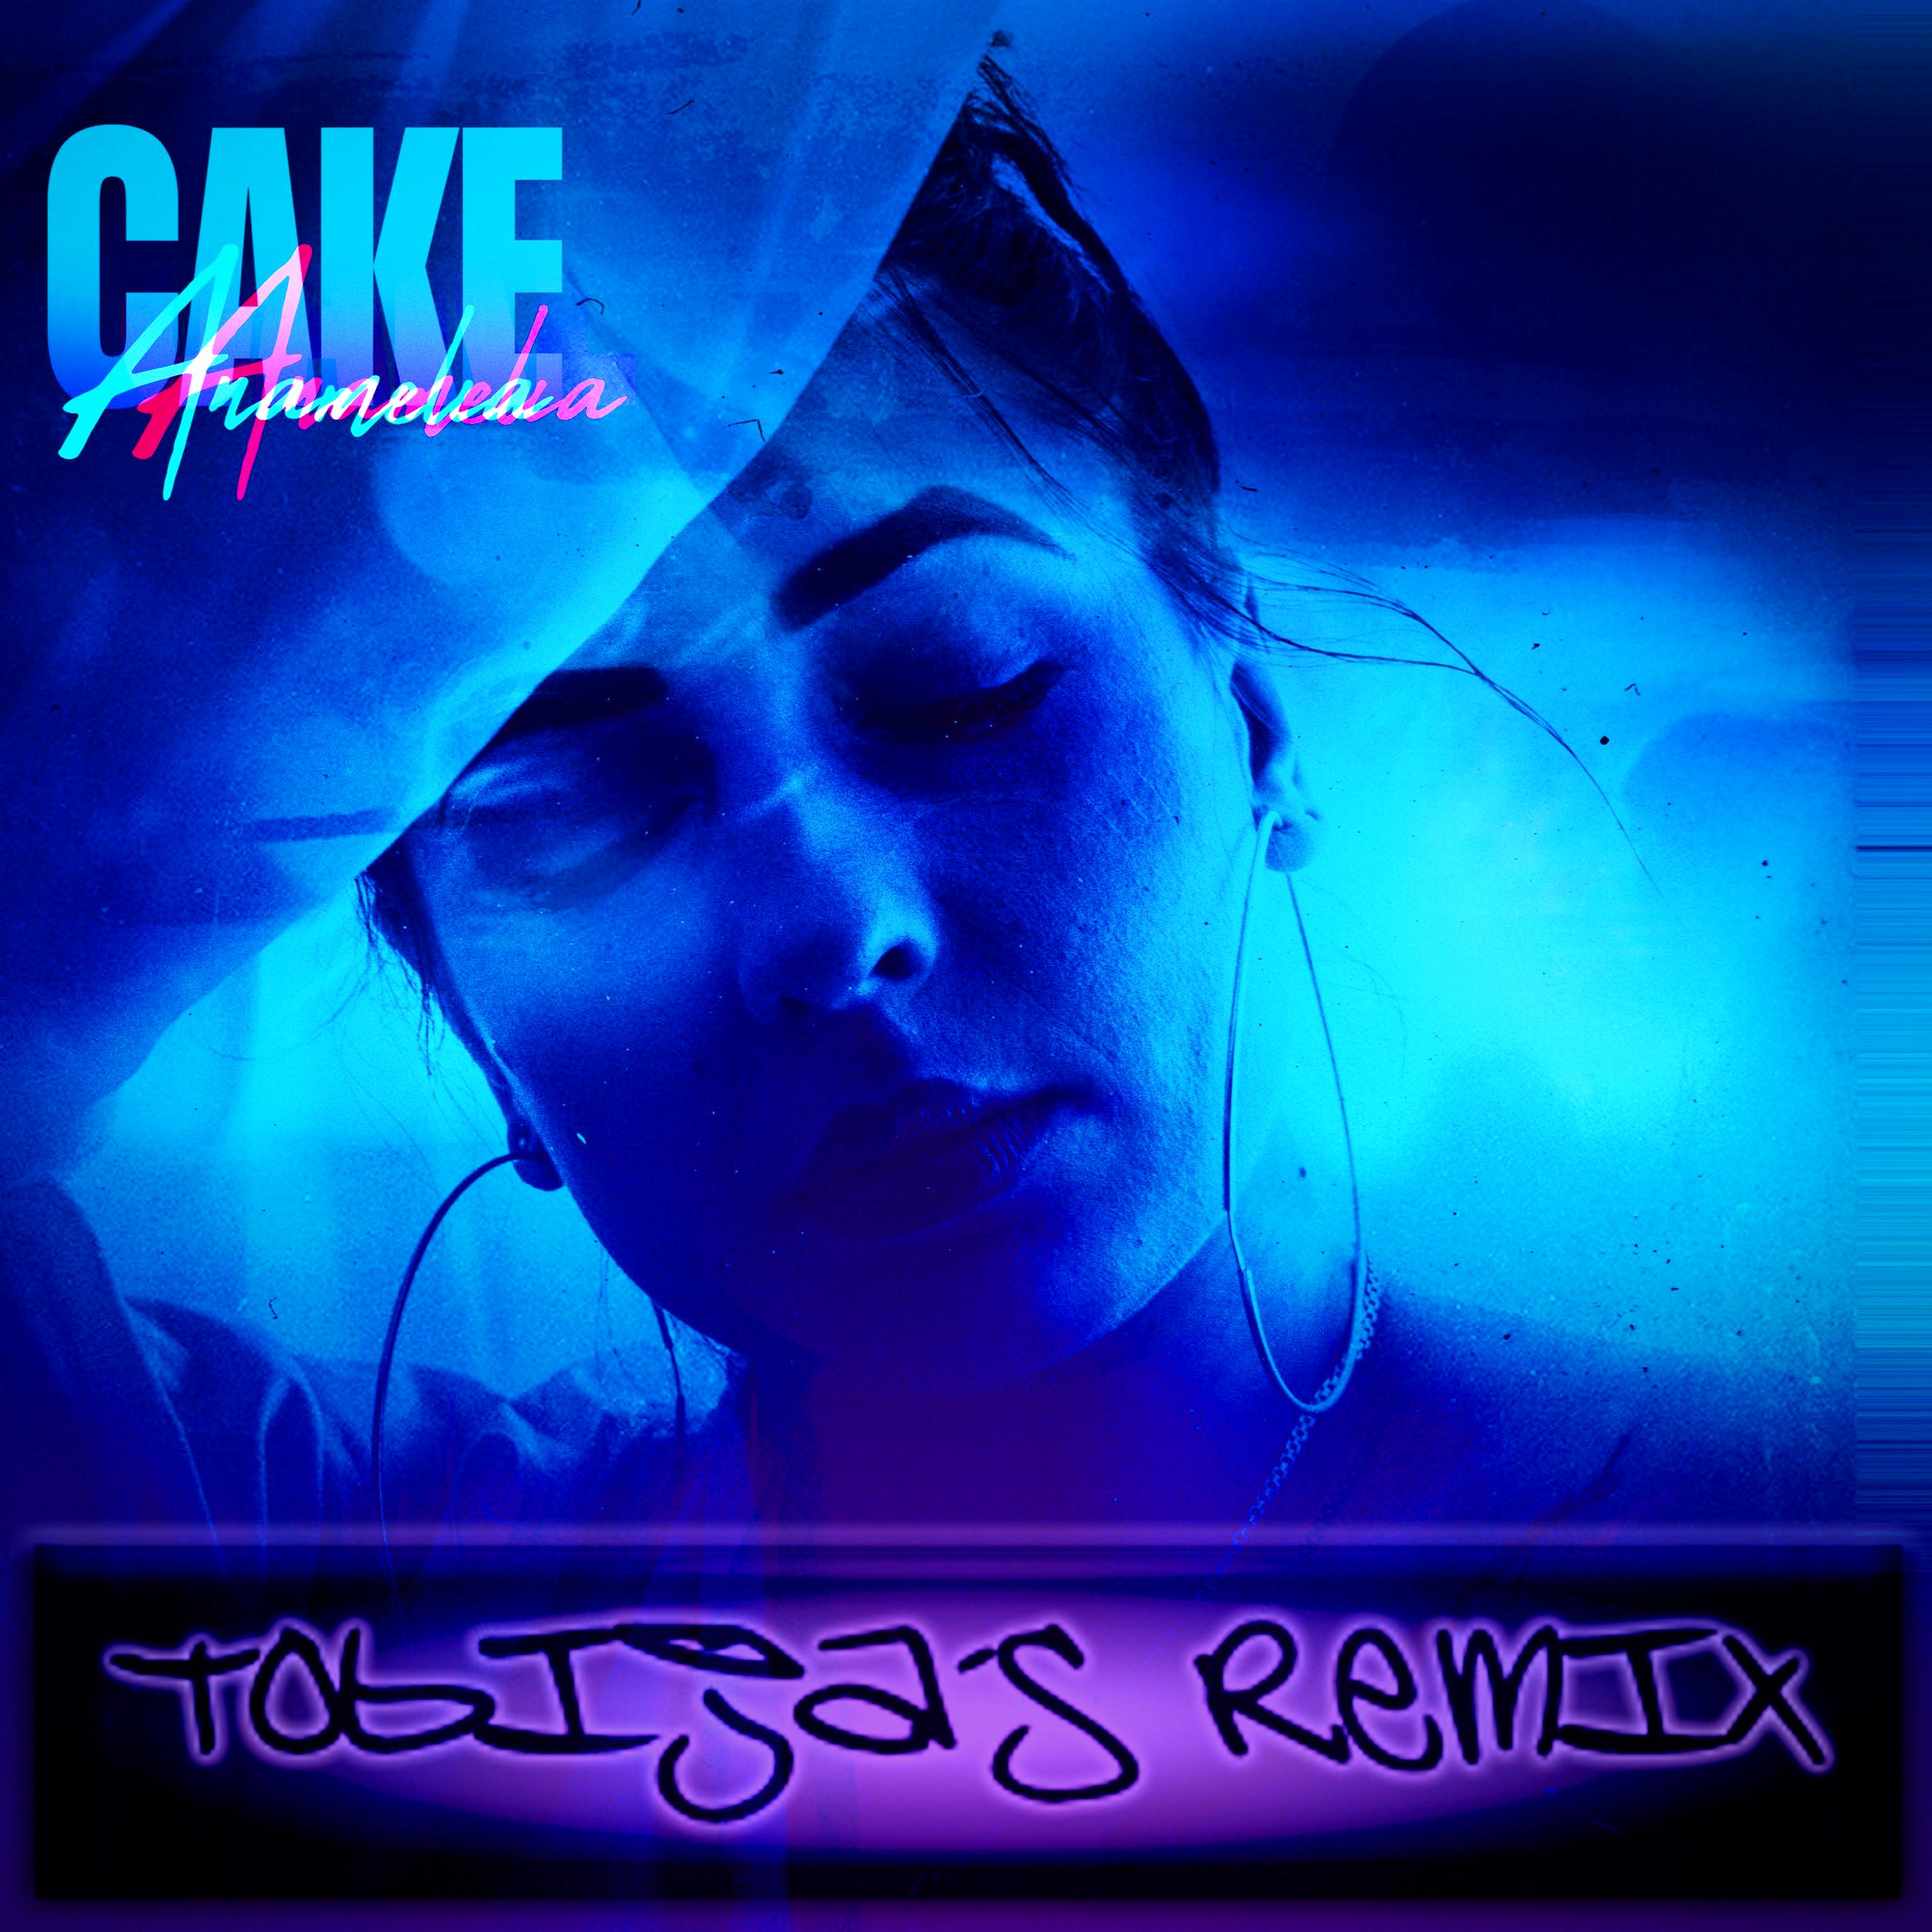 cake_officialremix_tobijartwork3